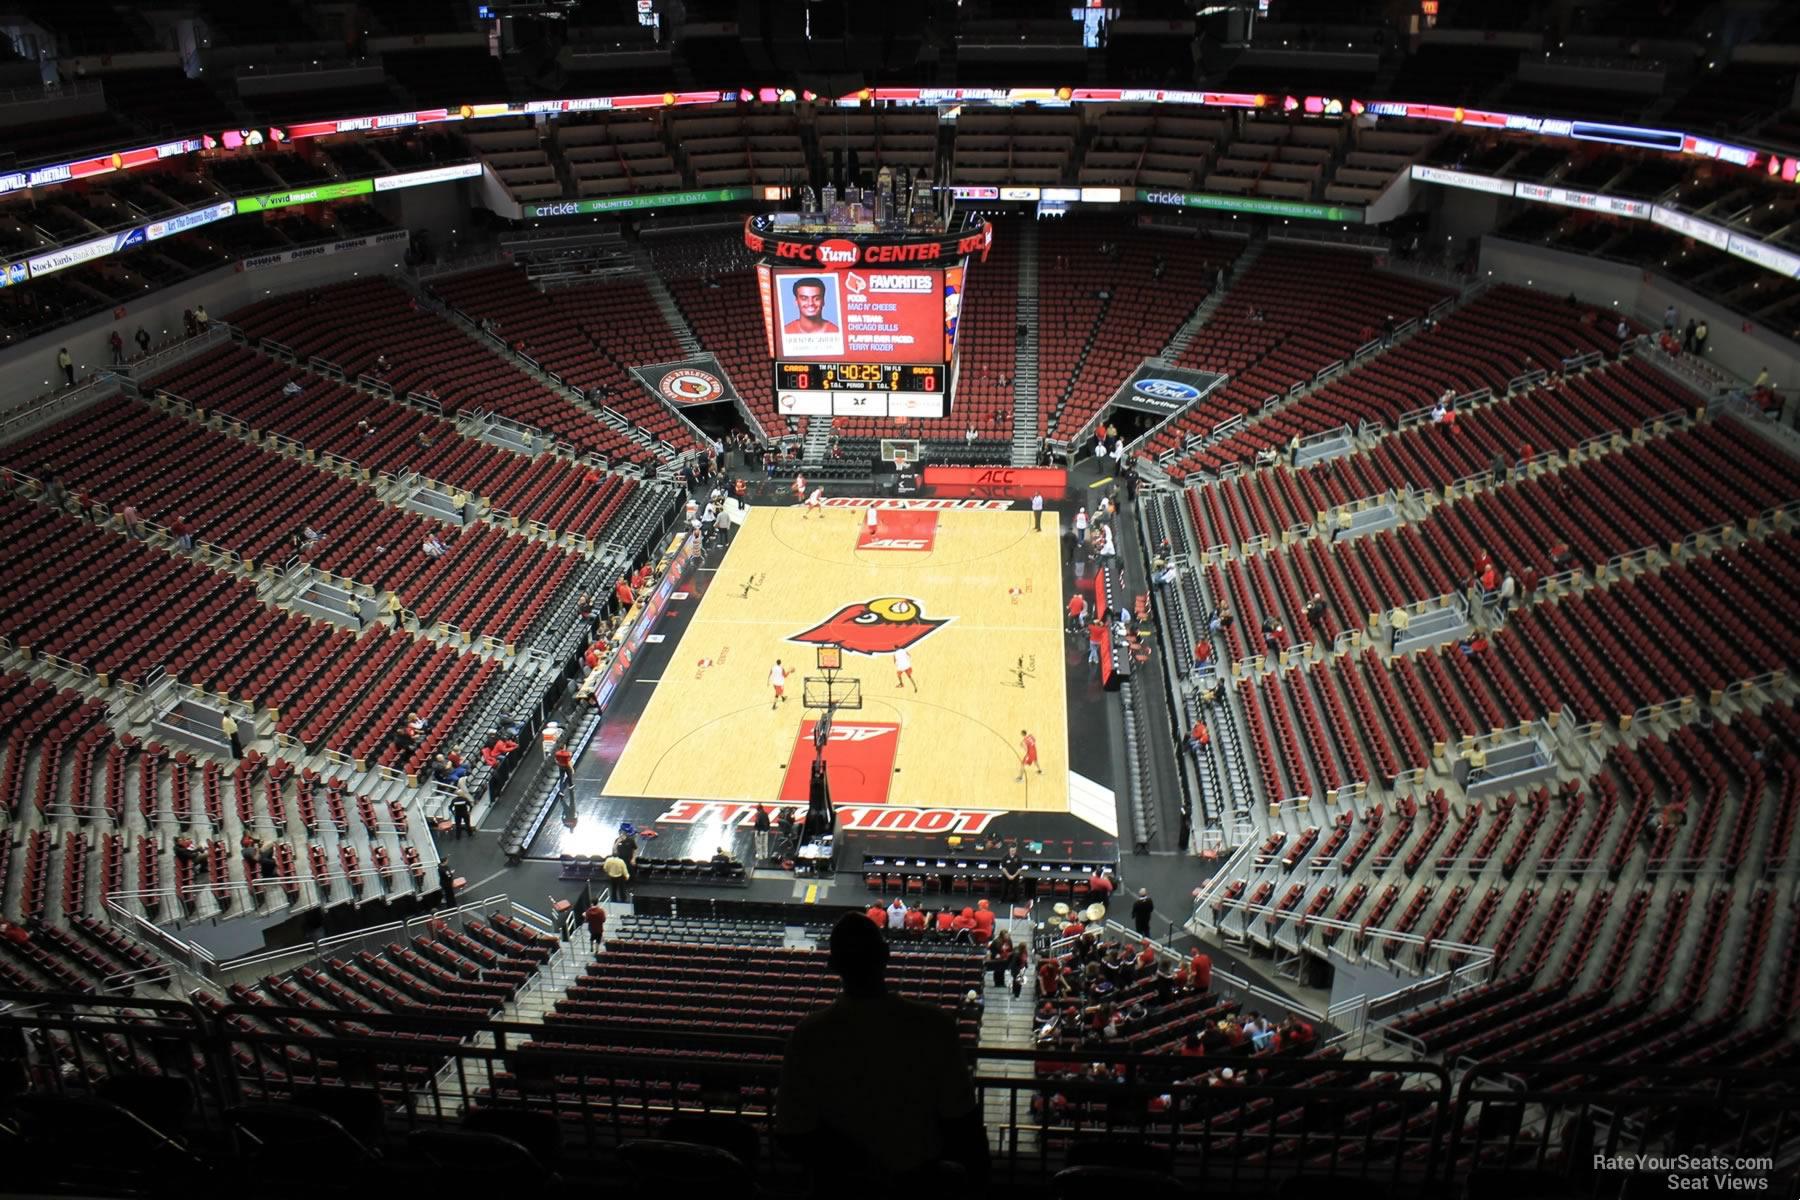 Rolling Stone ranks Yum Center one of top arenas in U.S. |Kfc Yum Arena